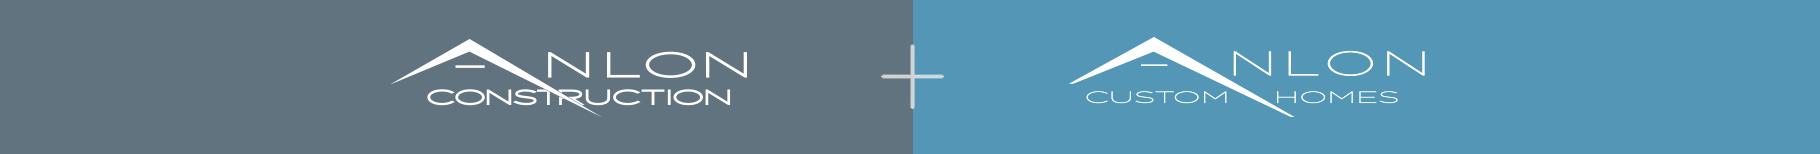 Anlon custom homes mobile logo